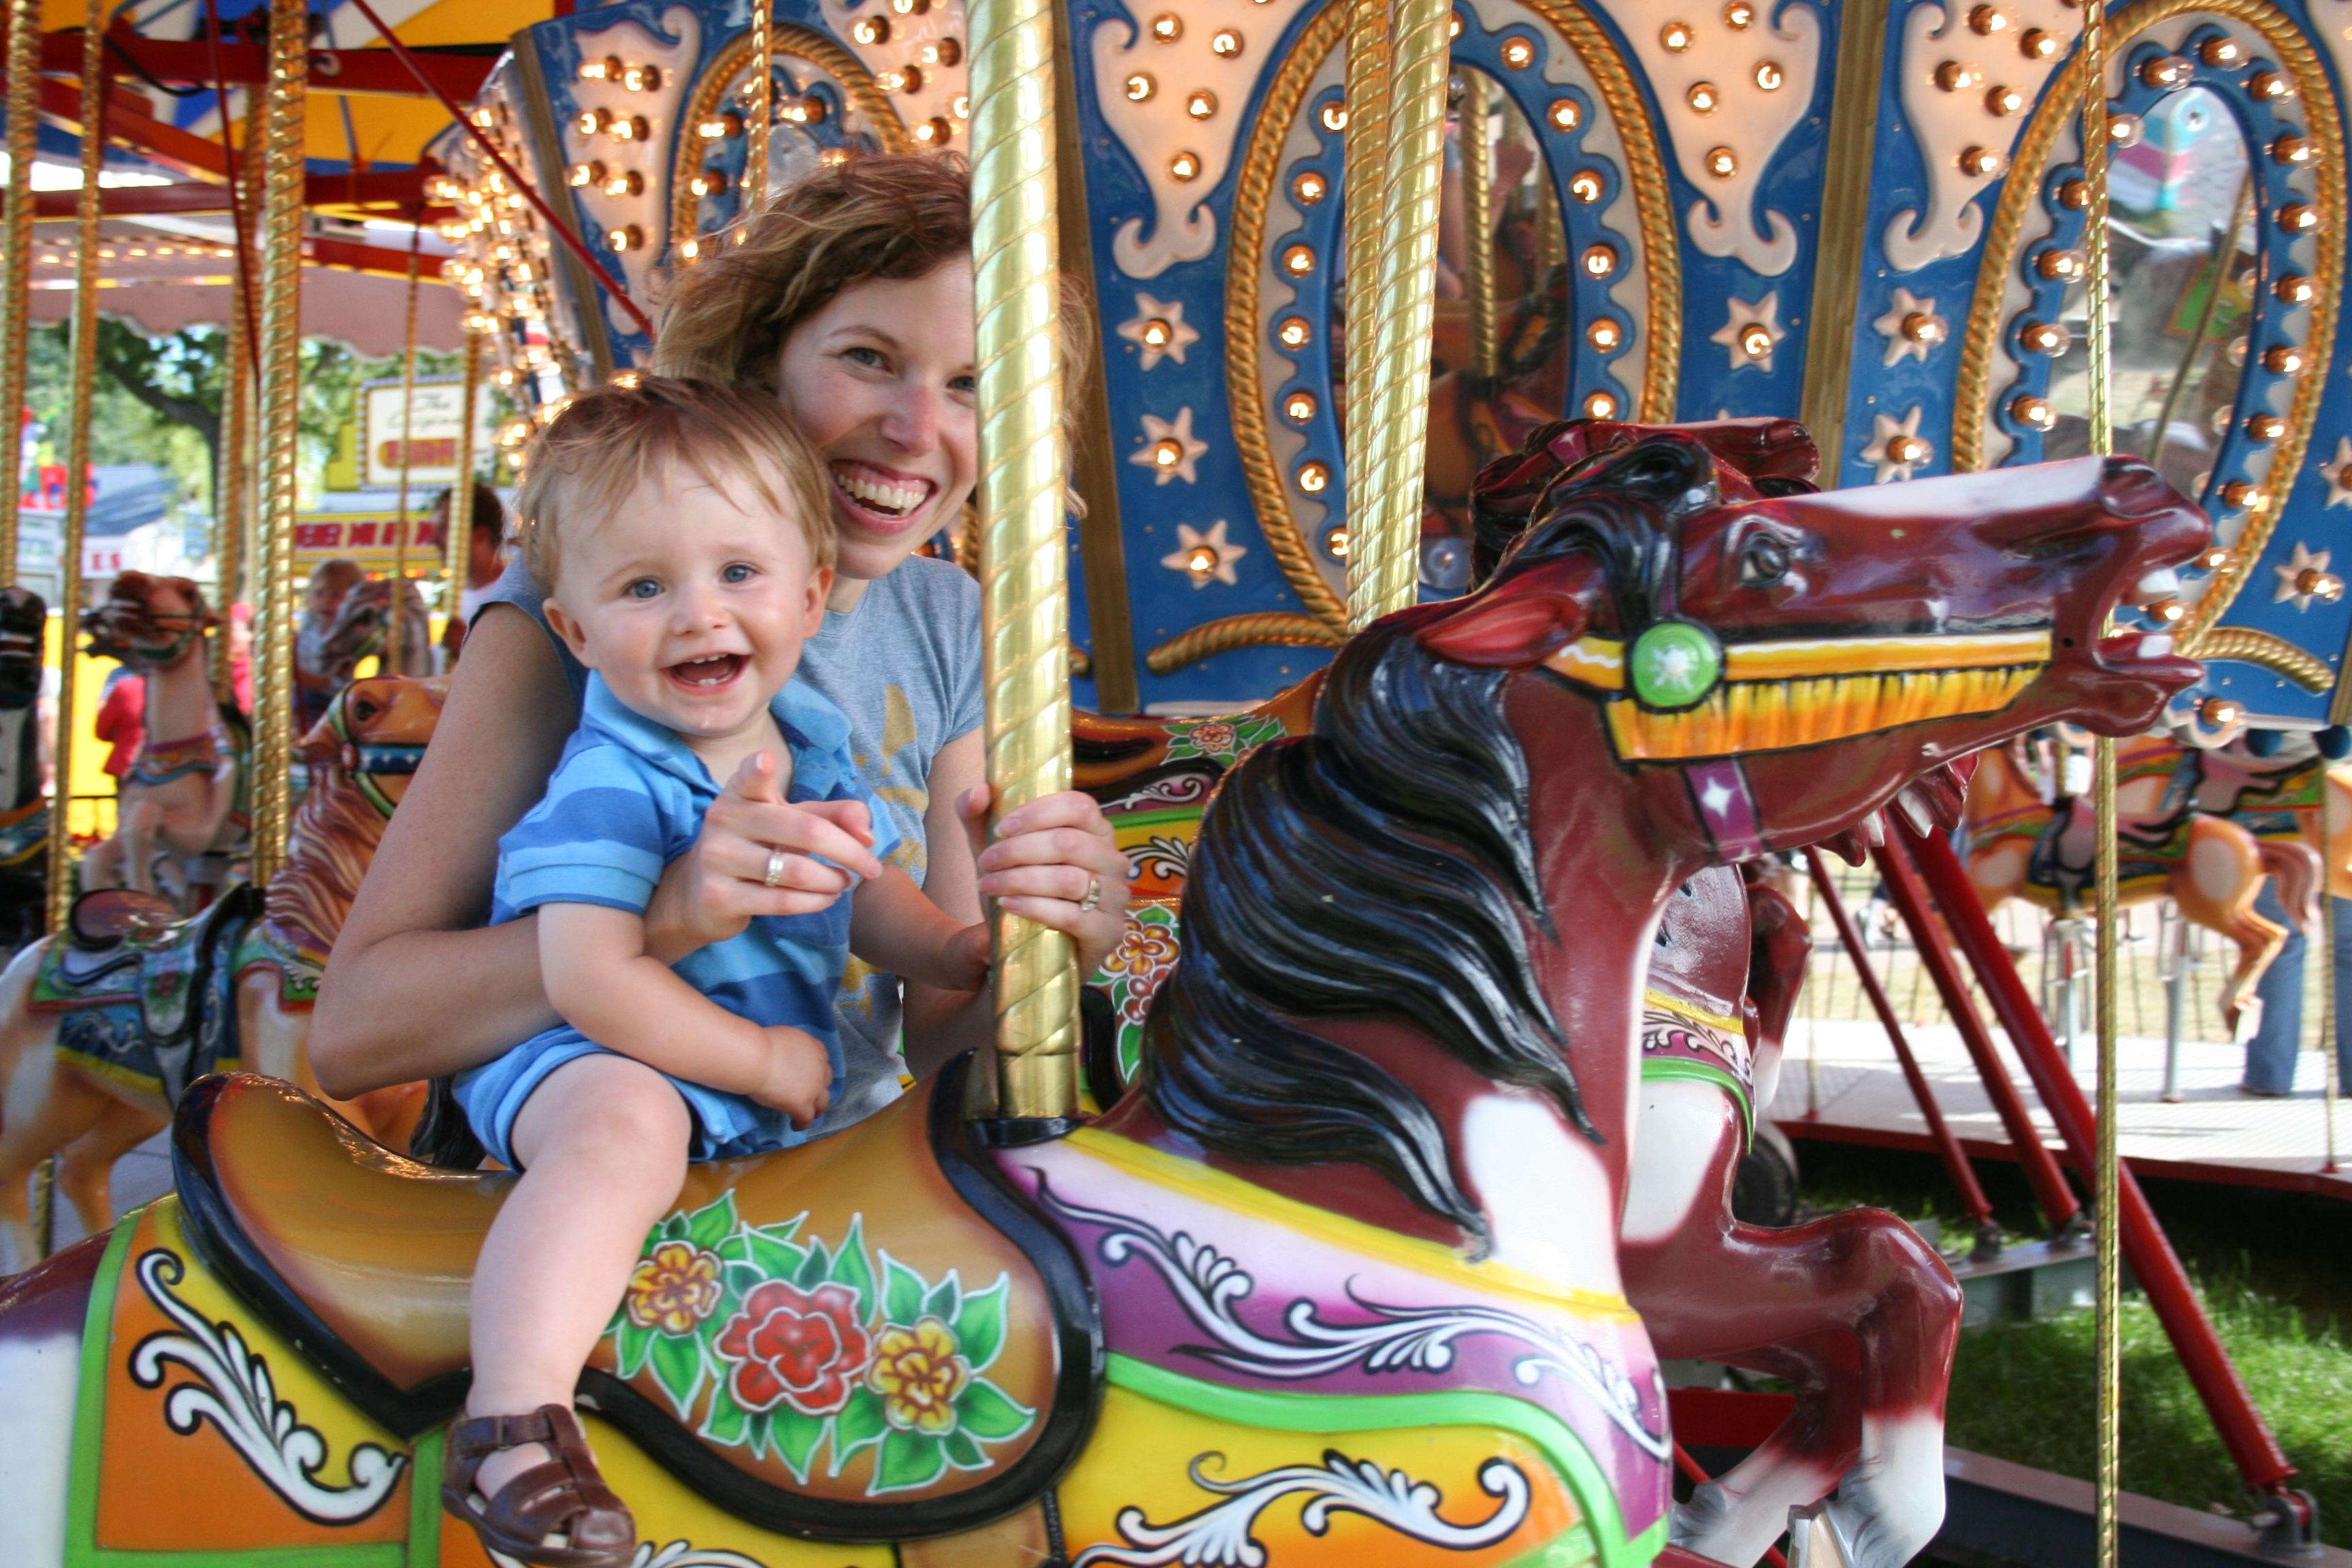 File:Carousel-MN State Fair-2006-31-08.jpg - Wikimedia Commons